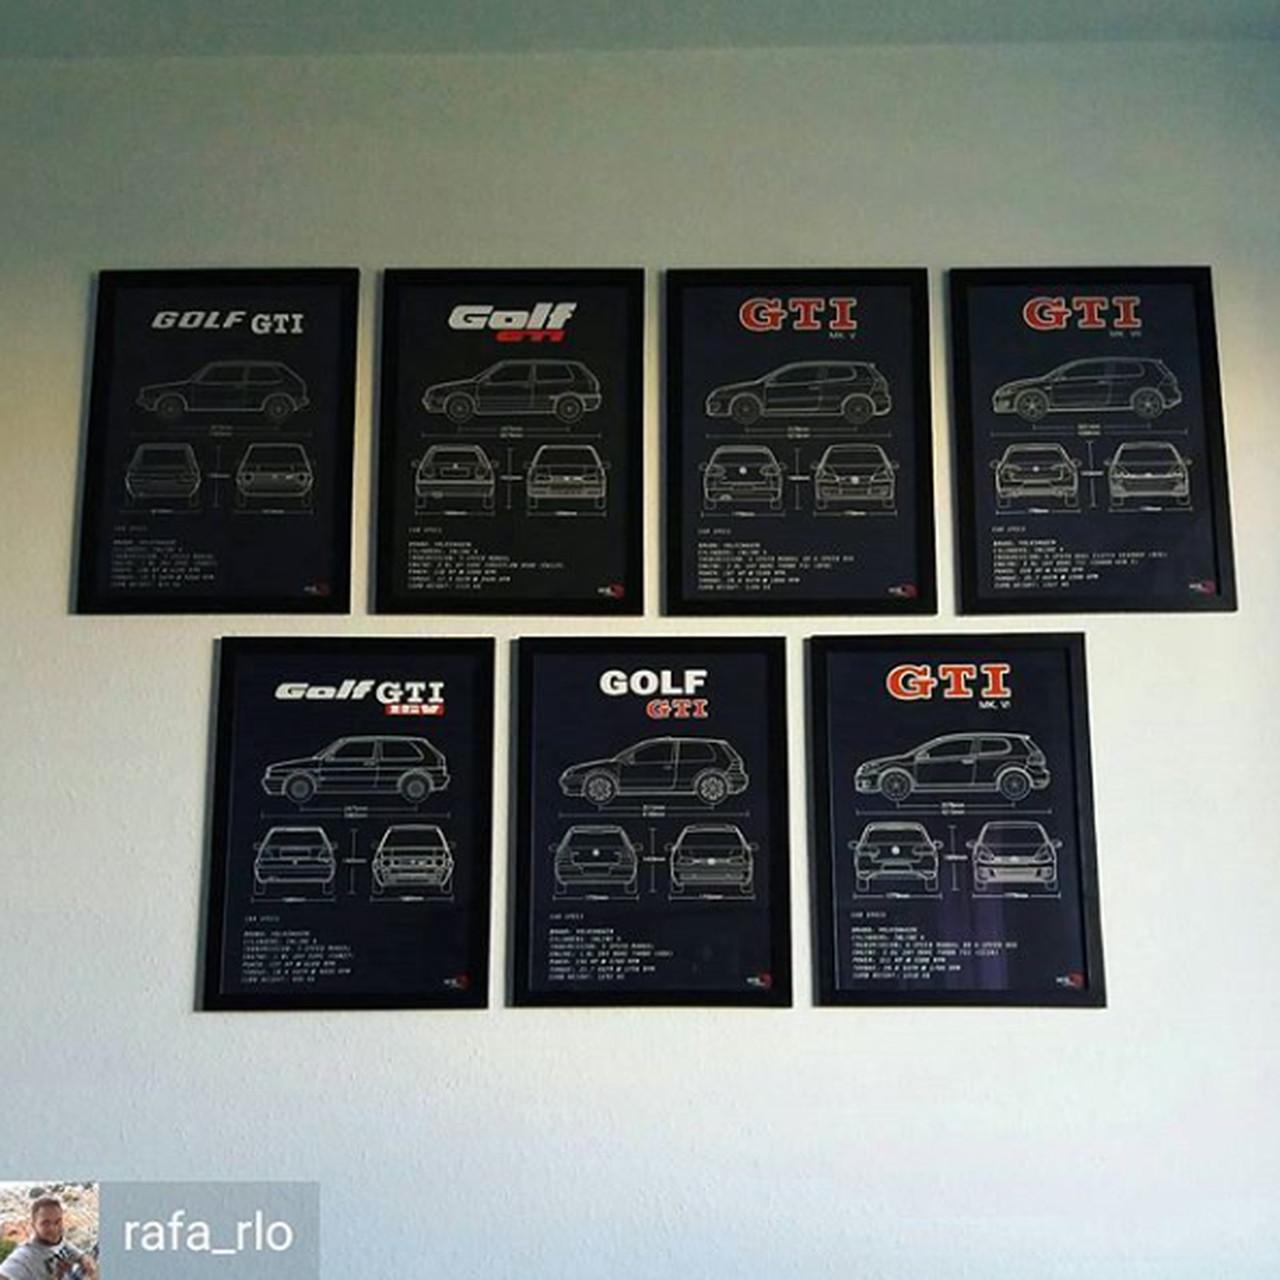 QUADRO/POSTER VOLKSWAGEN GOLF GTI MK6